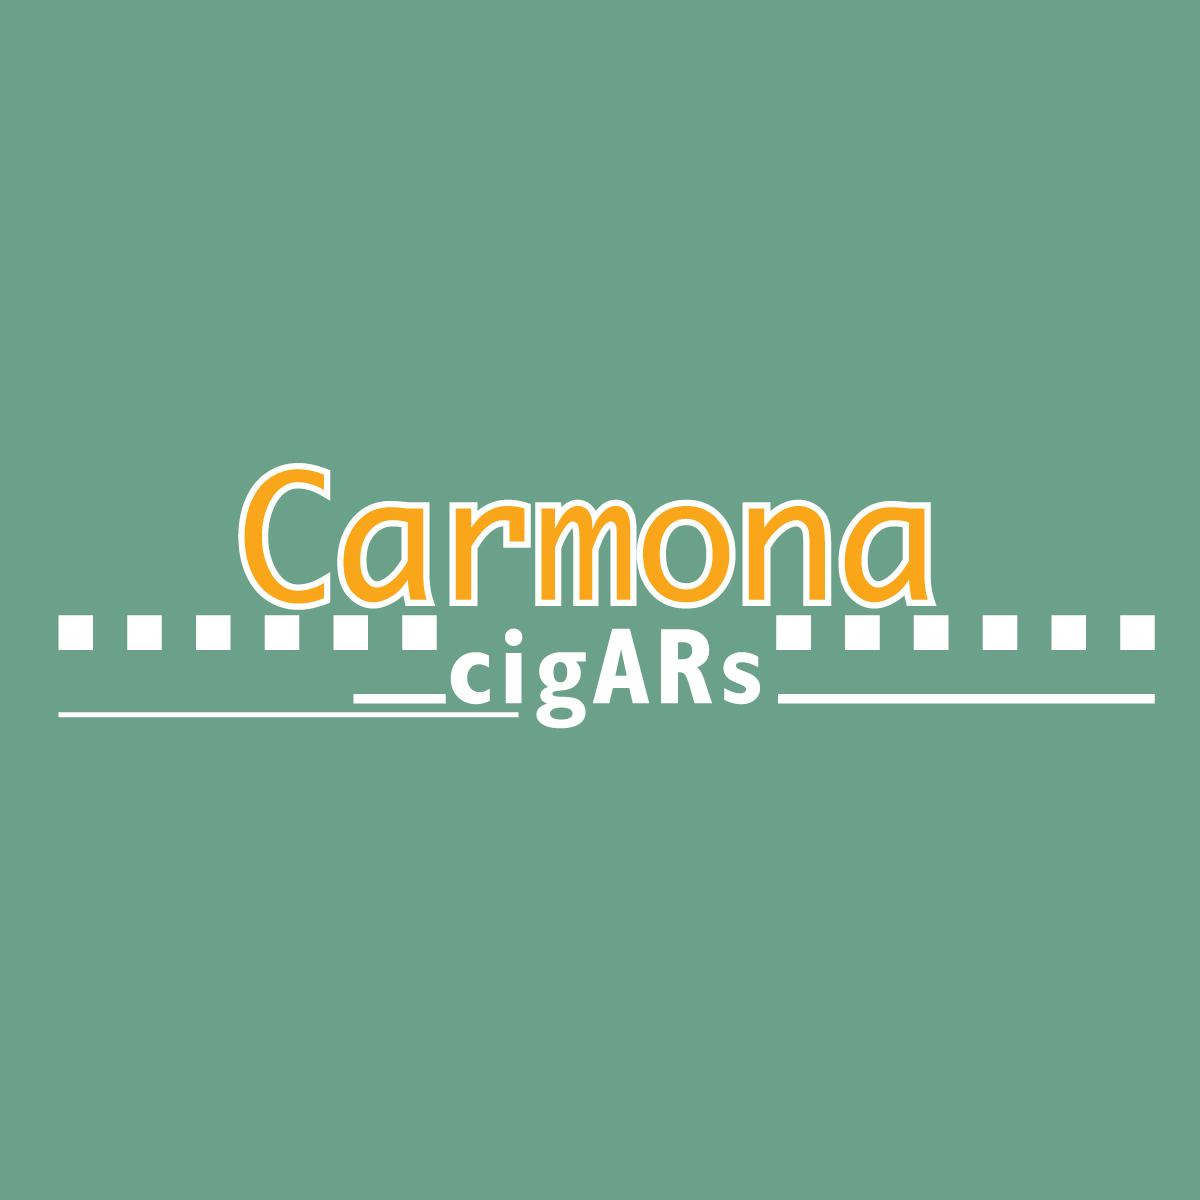 Carmona_Cigars_logo_01.jpg